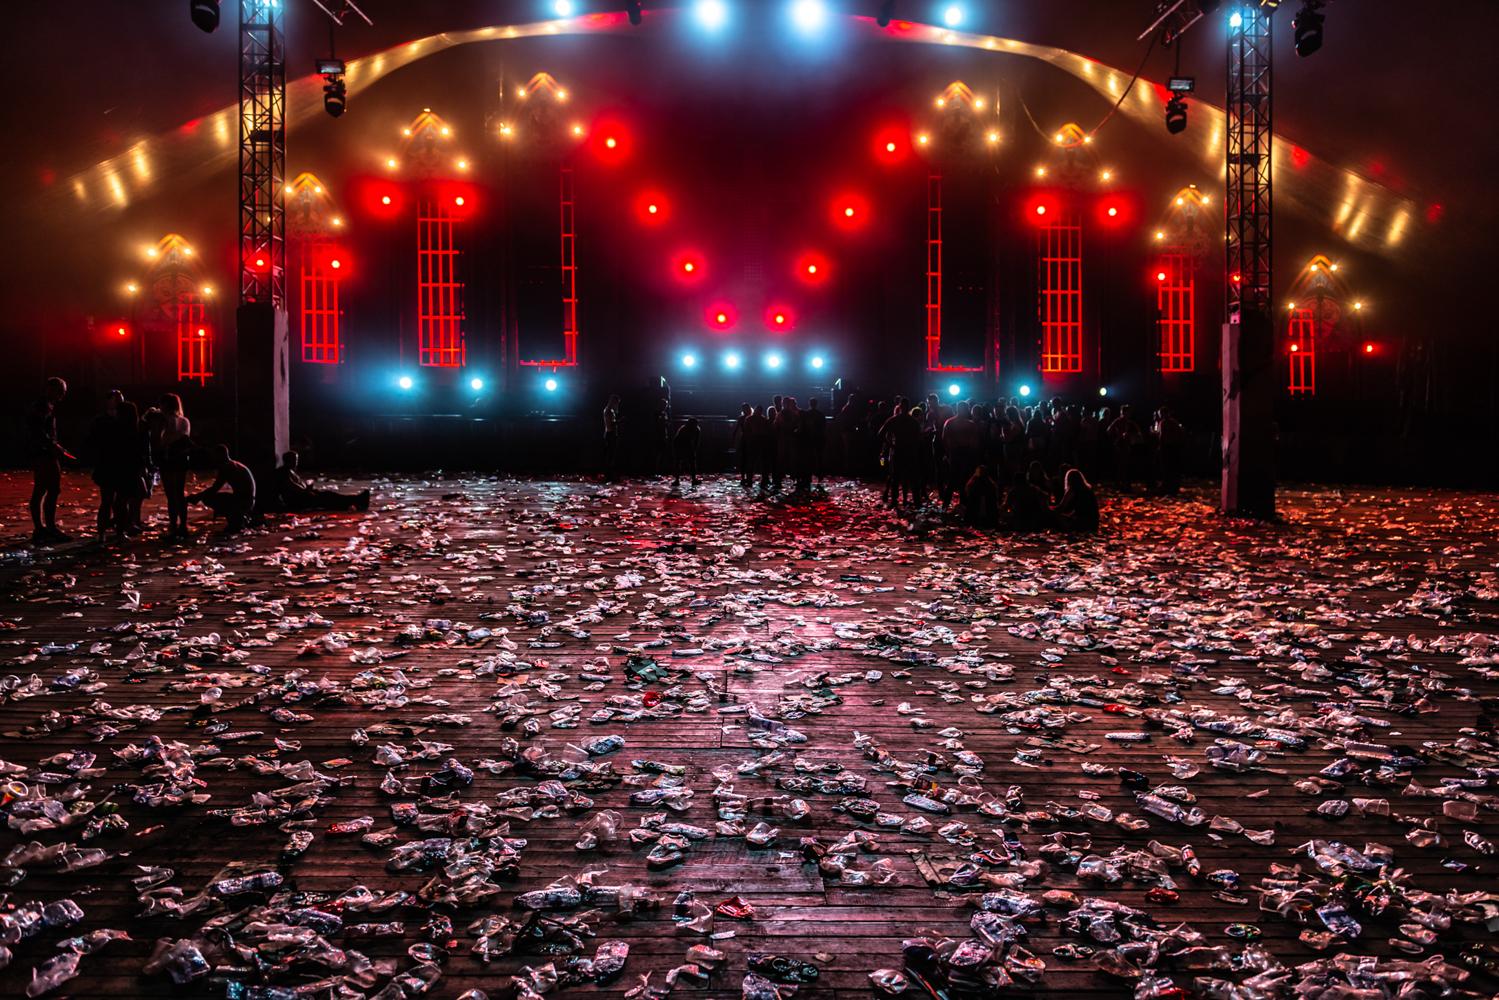 Tanguy van Eeckhoudt 2019 - Trash Rave - 6.jpg